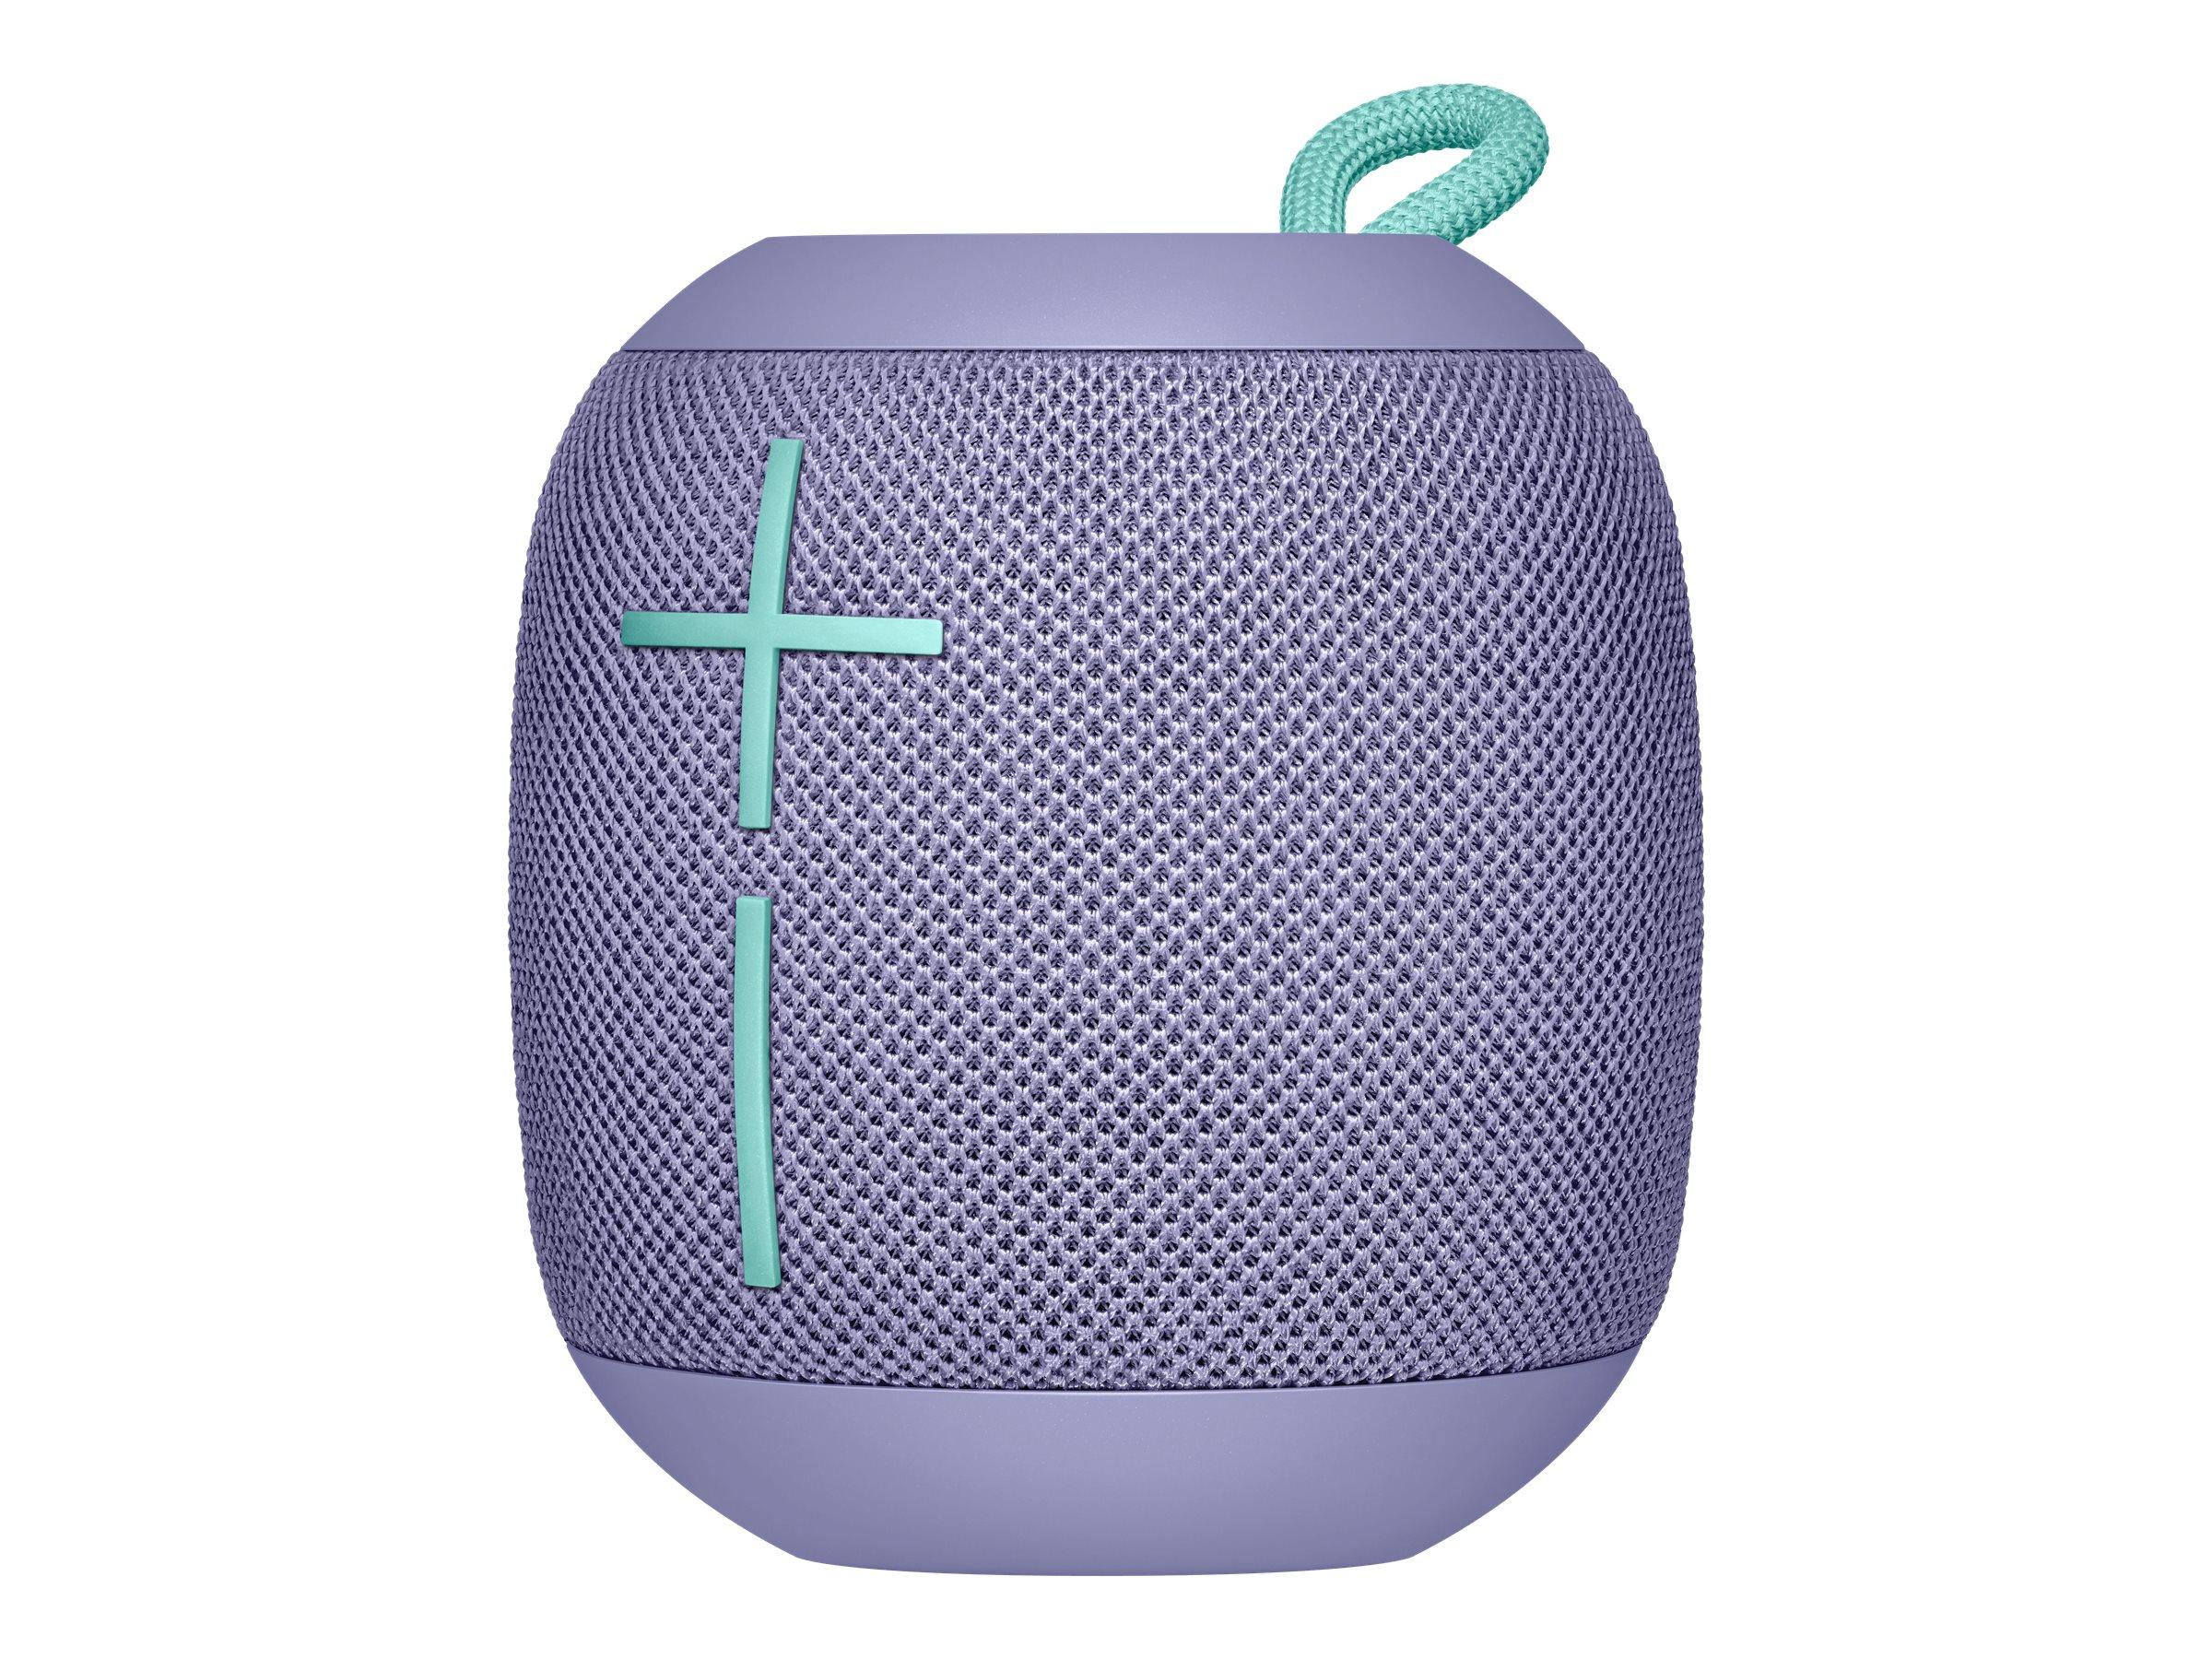 Ultimate Ears WONDERBOOM - Lautsprecher - tragbar - kabellos - Bluetooth - fliederfarben